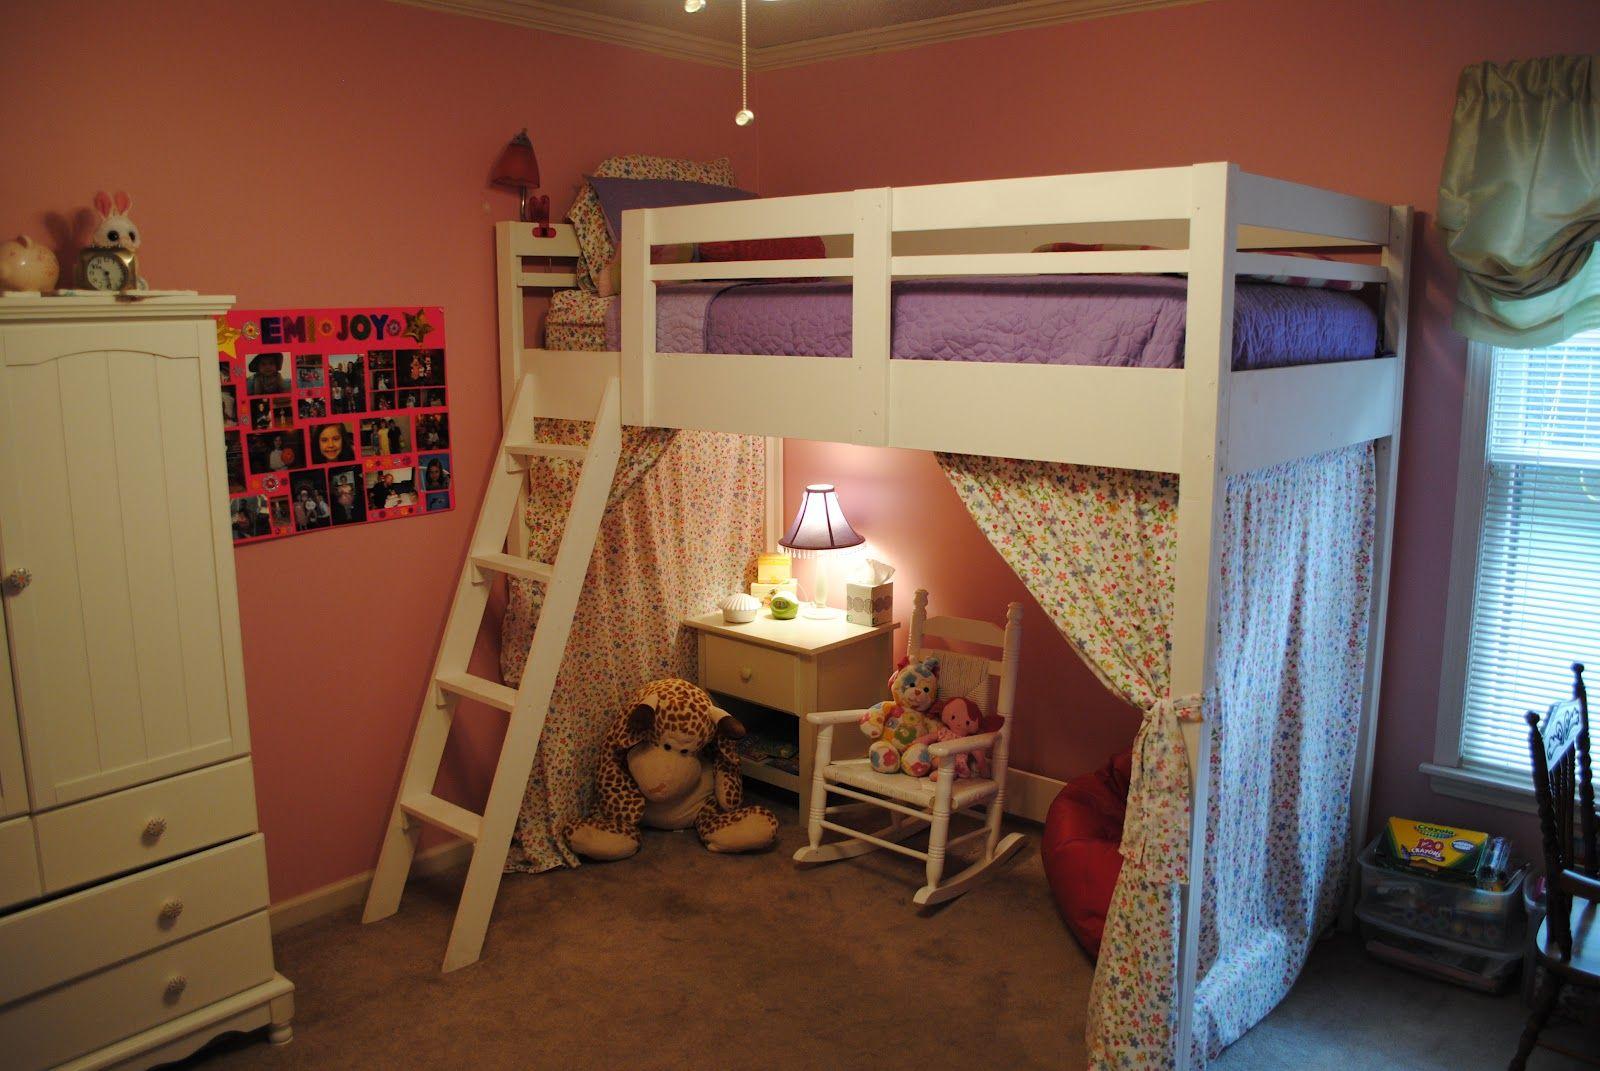 Loft Bed Loft bed, Girls loft bed, Loft bed curtains